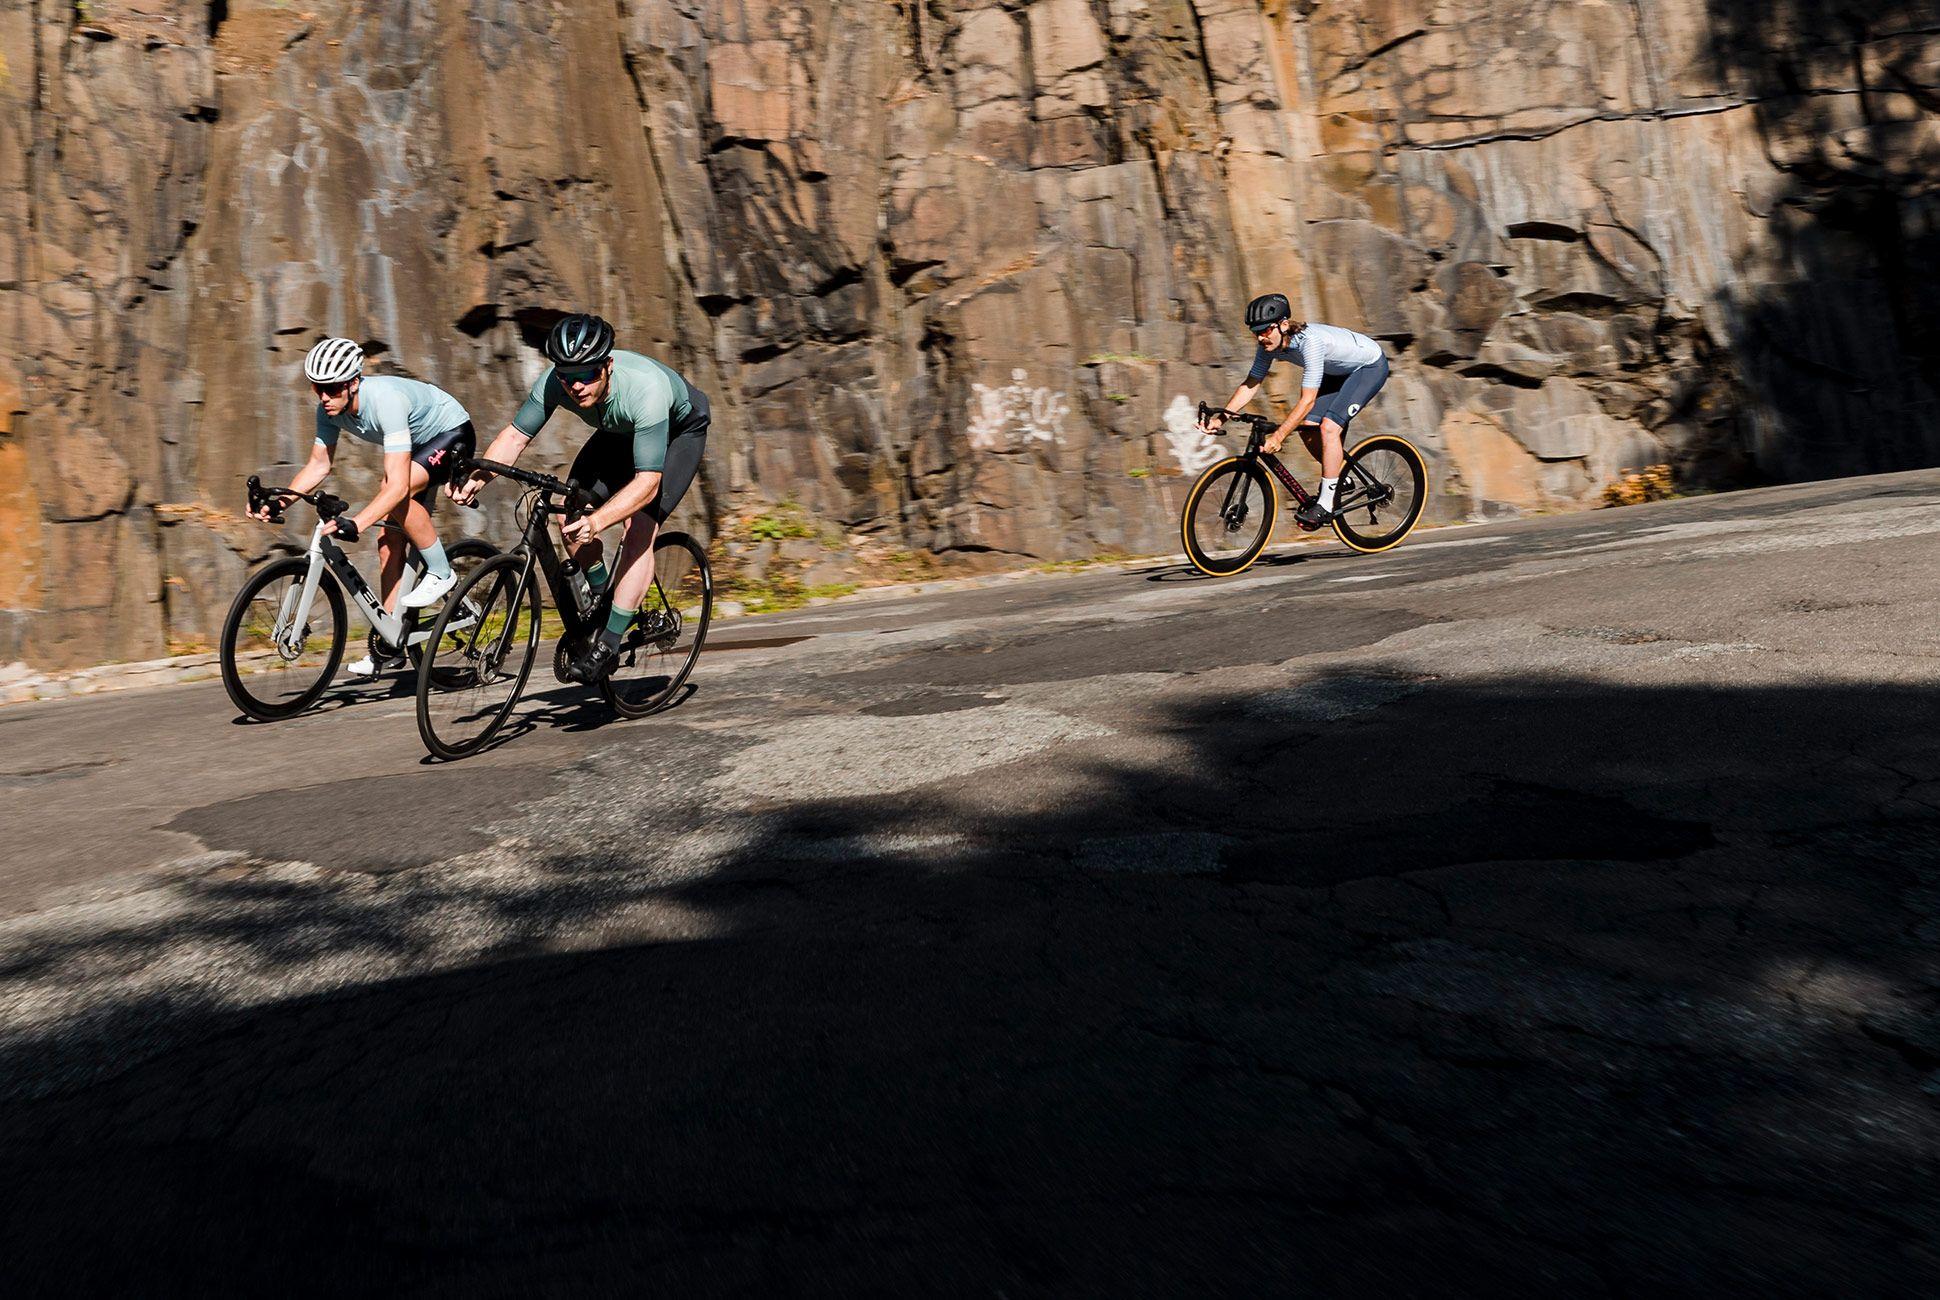 Summer-Cycling-Kits-2018-gear-patrol-aj-slide-3